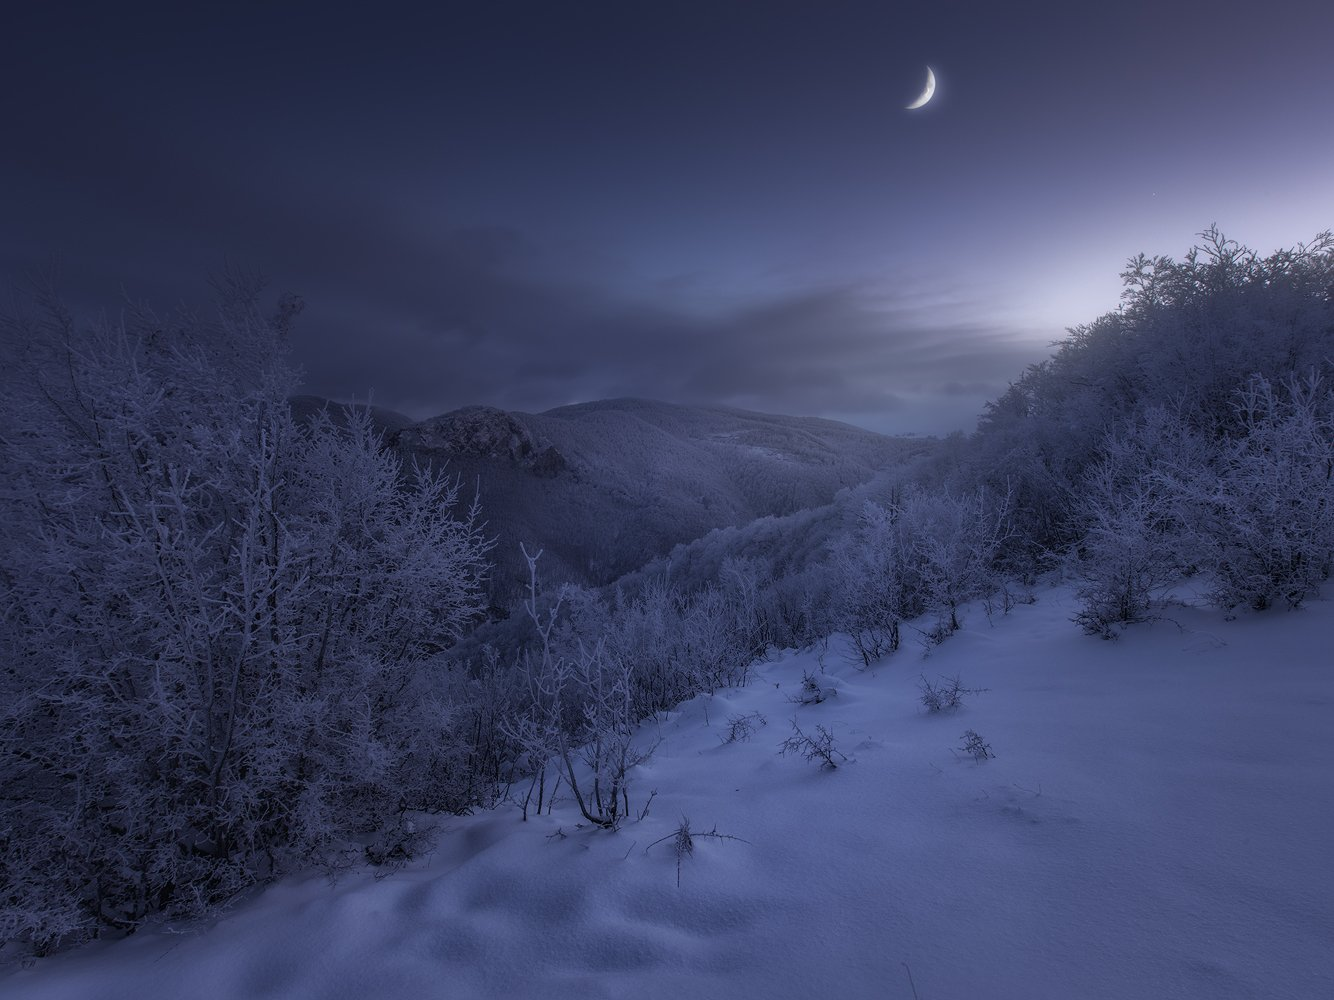 winter snow mountins moon blue hour bluehour landscape nature freezing ice, Lyuboslav